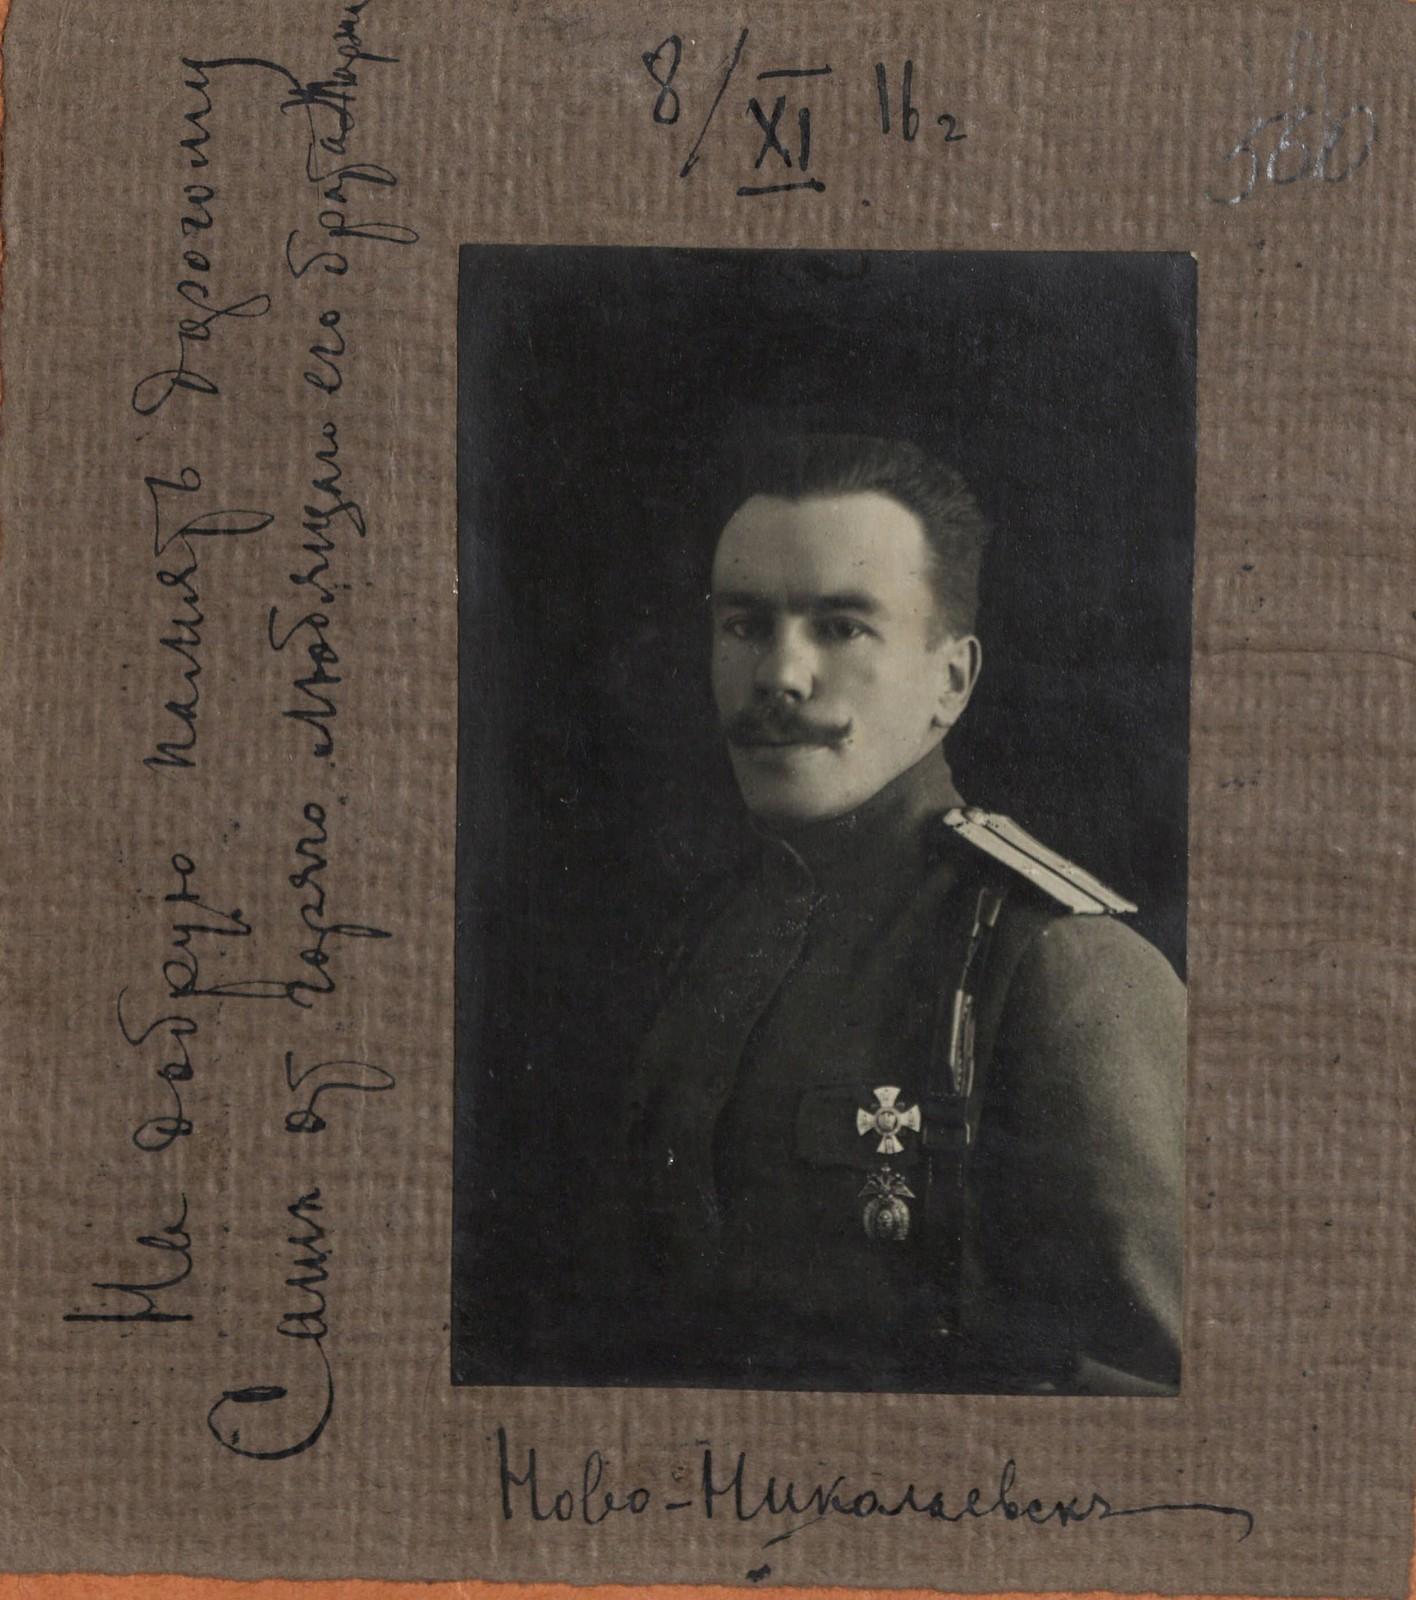 510. 1916